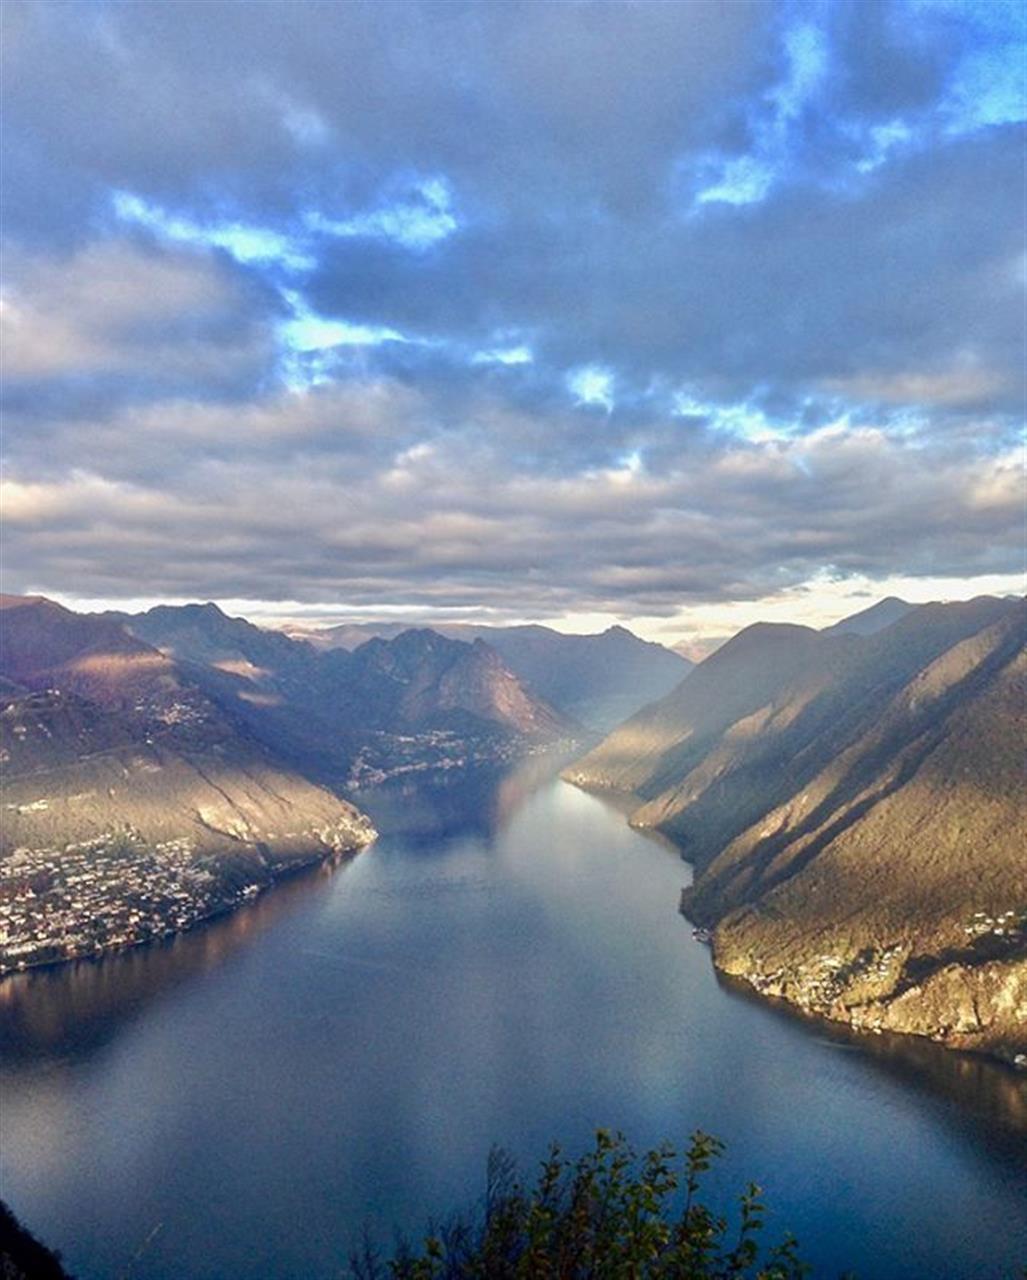 Lake Lugano in Ticino Switzerland in autumn.  #lakelugano #ticino #switzerland #luxuryrealestate #luxurylife  #luxurylifestyle #christiesinternationalrealestate #luxuryportfolio #wetagconsulting #leadingre #ChristiesHomes #takemehere #FF #instafollow #l4l #tagforlikes #followback #instagood #tbt #photooftheday #followme #likeforlike #LeadingRElocal